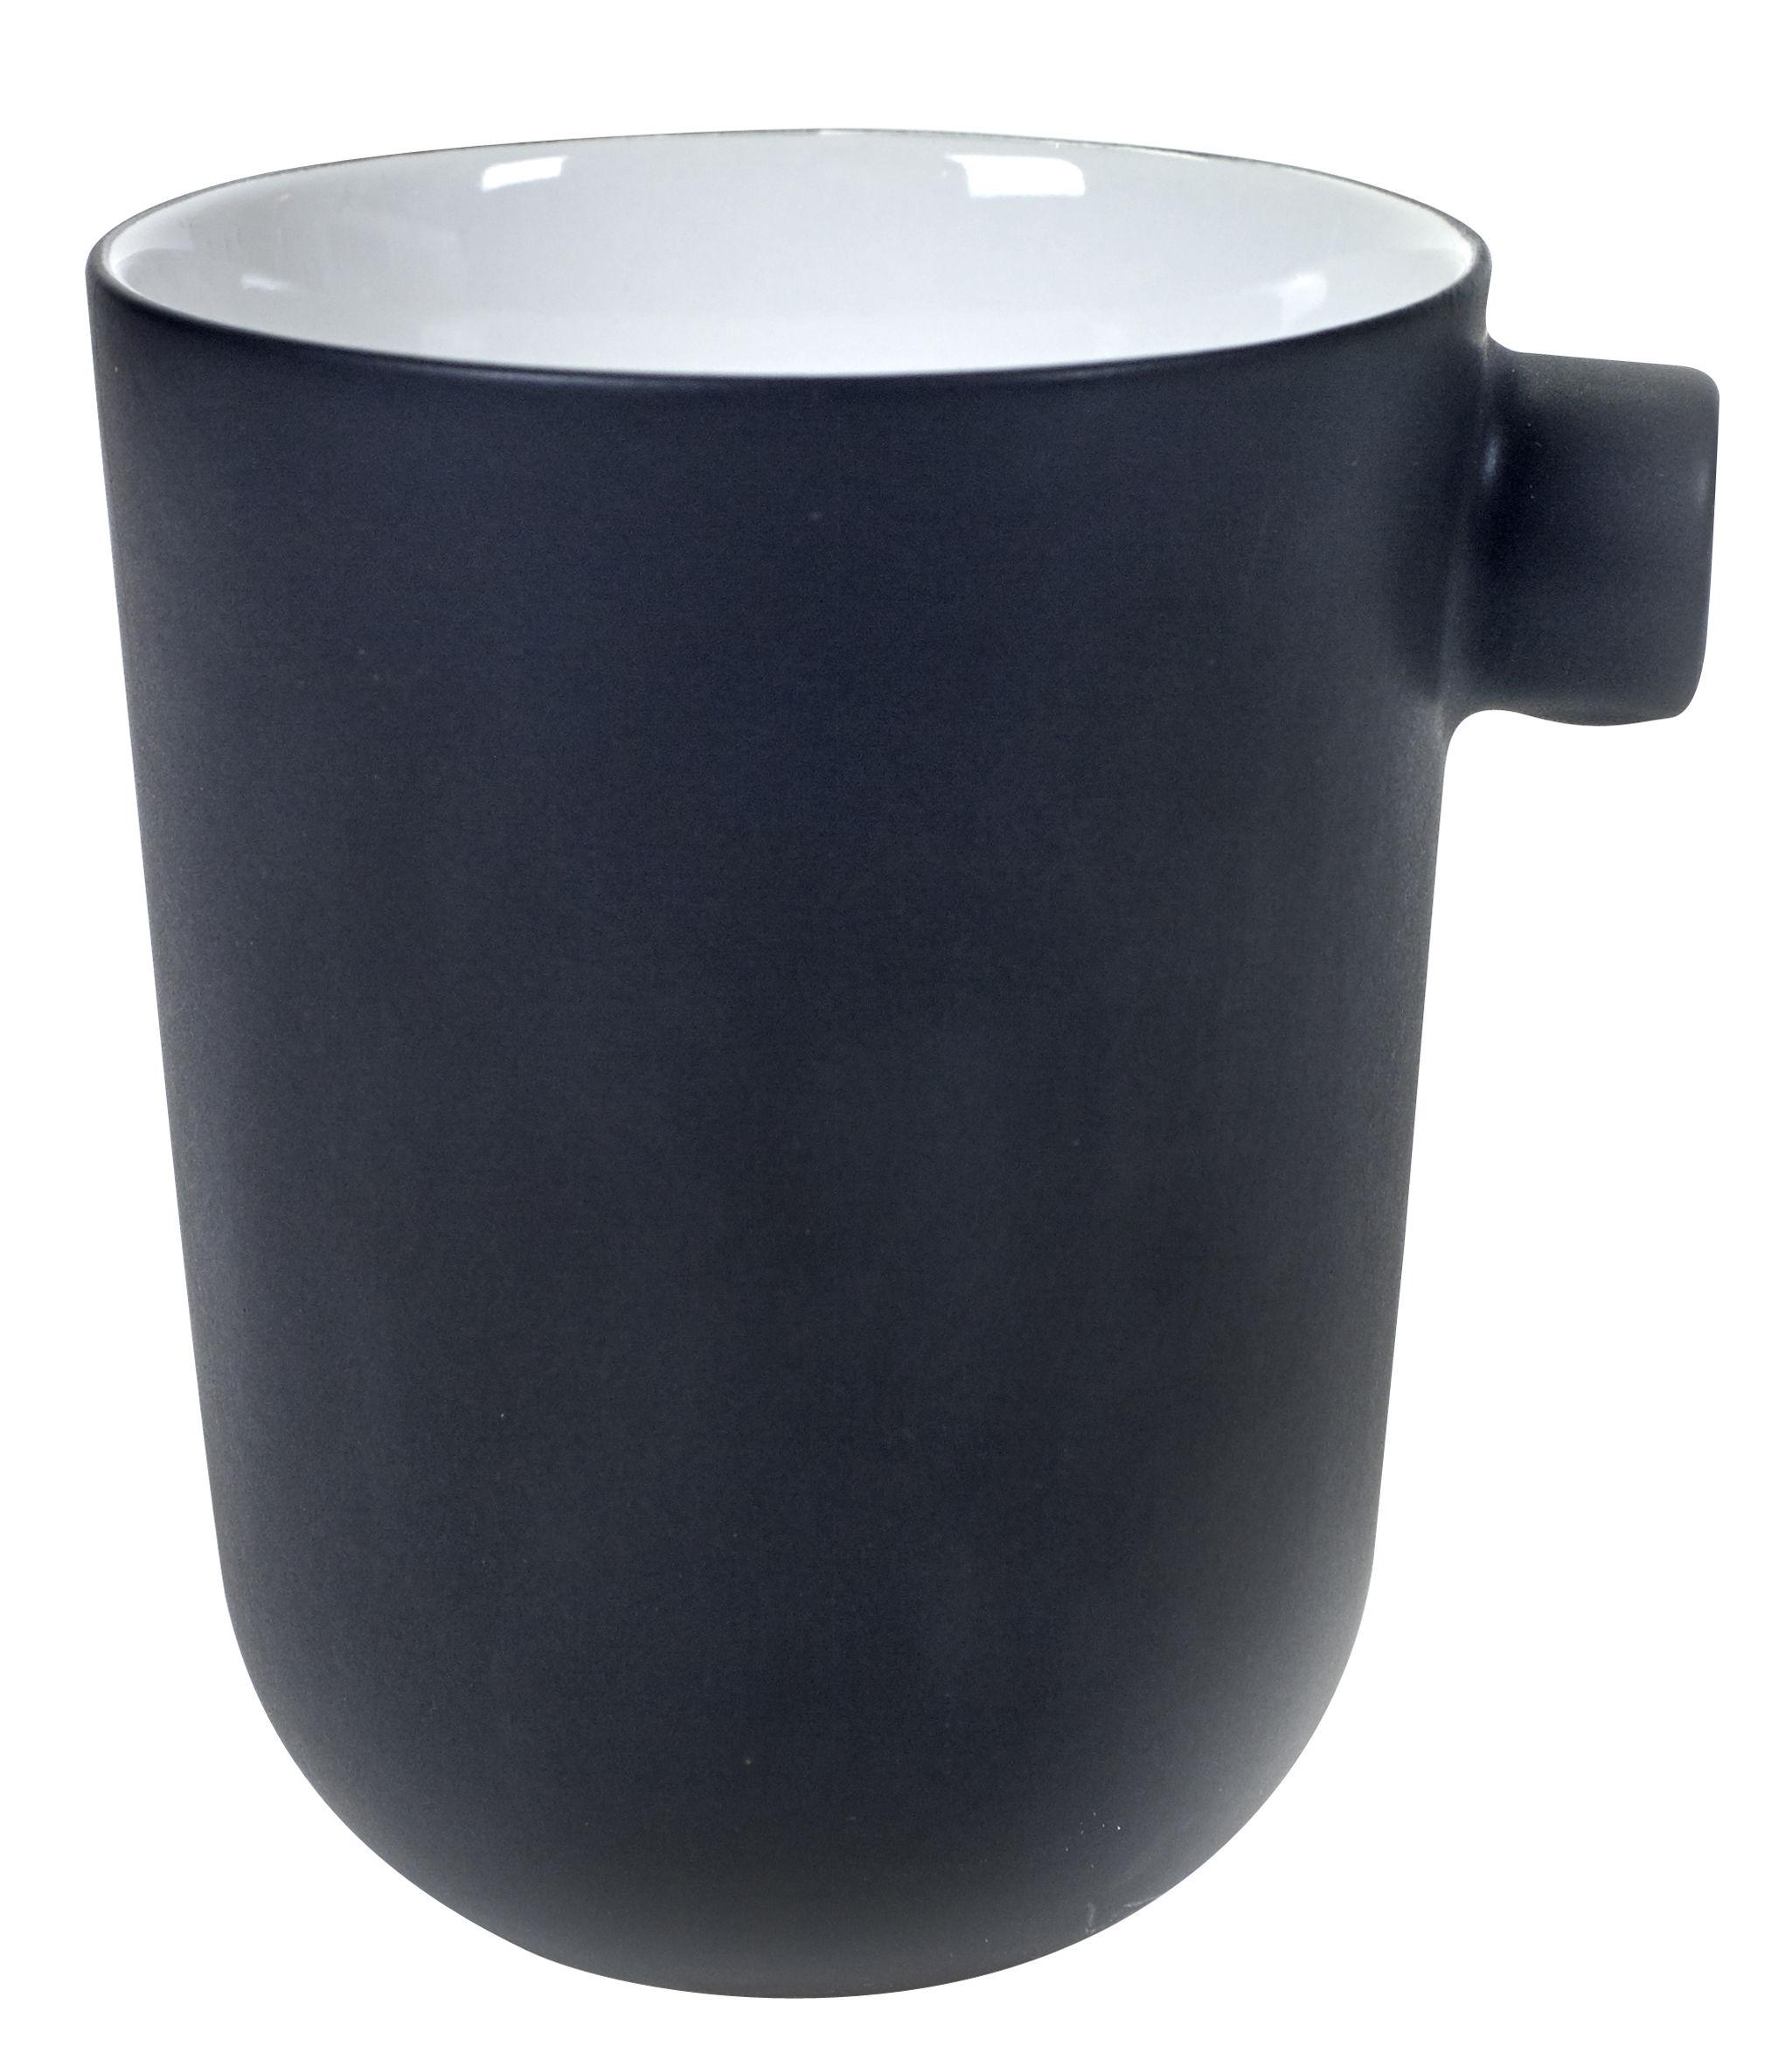 Arts de la table - Tasses et mugs - Mug Daily Beginnings - Serax - Noir - Grès